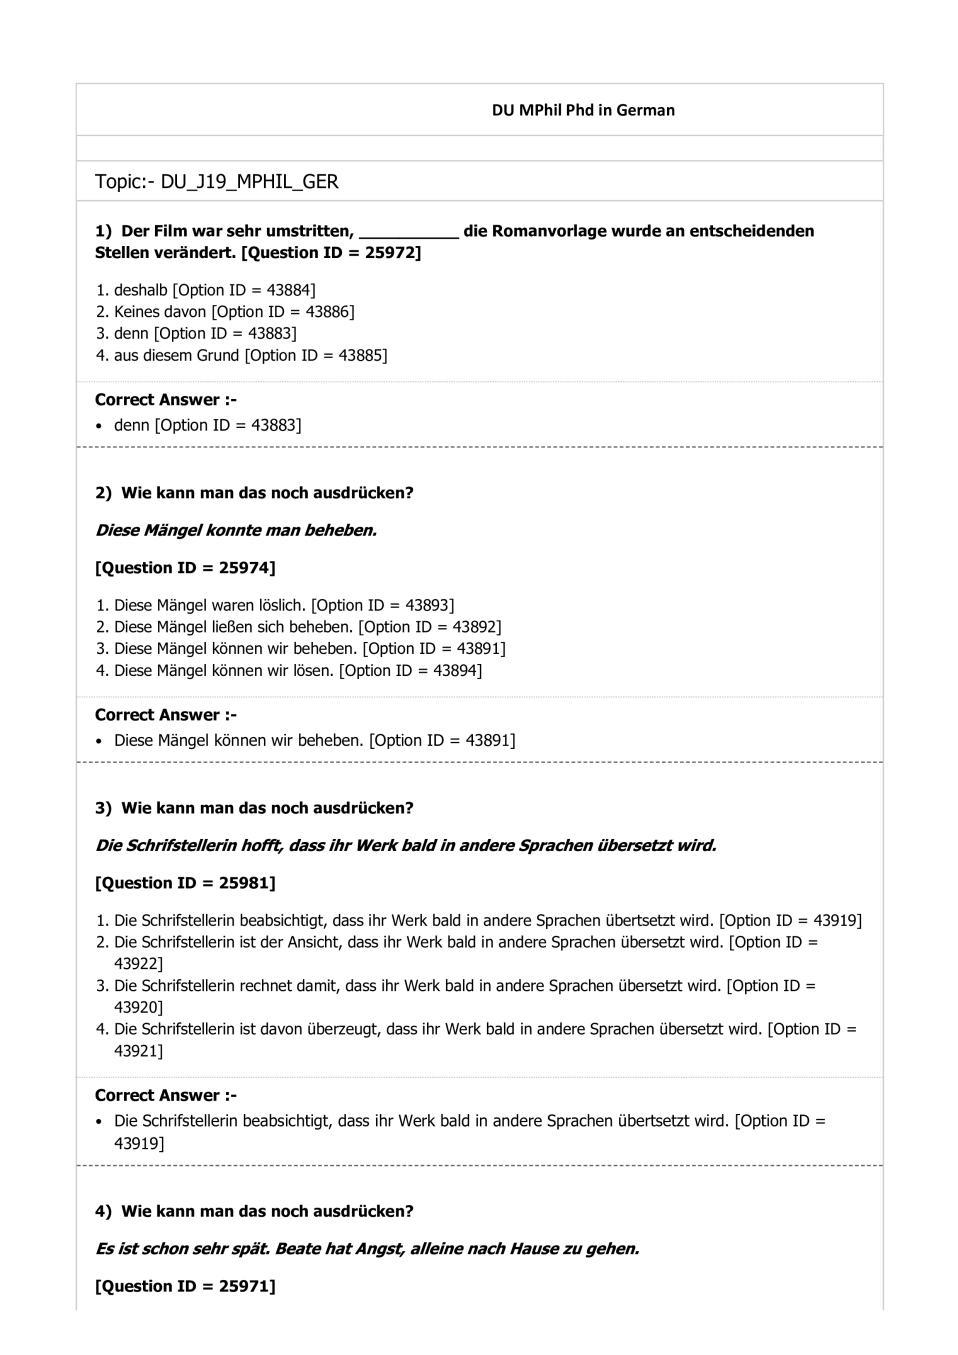 DUET Question Paper 2019 for M.Phil Ph.D German - Page 1